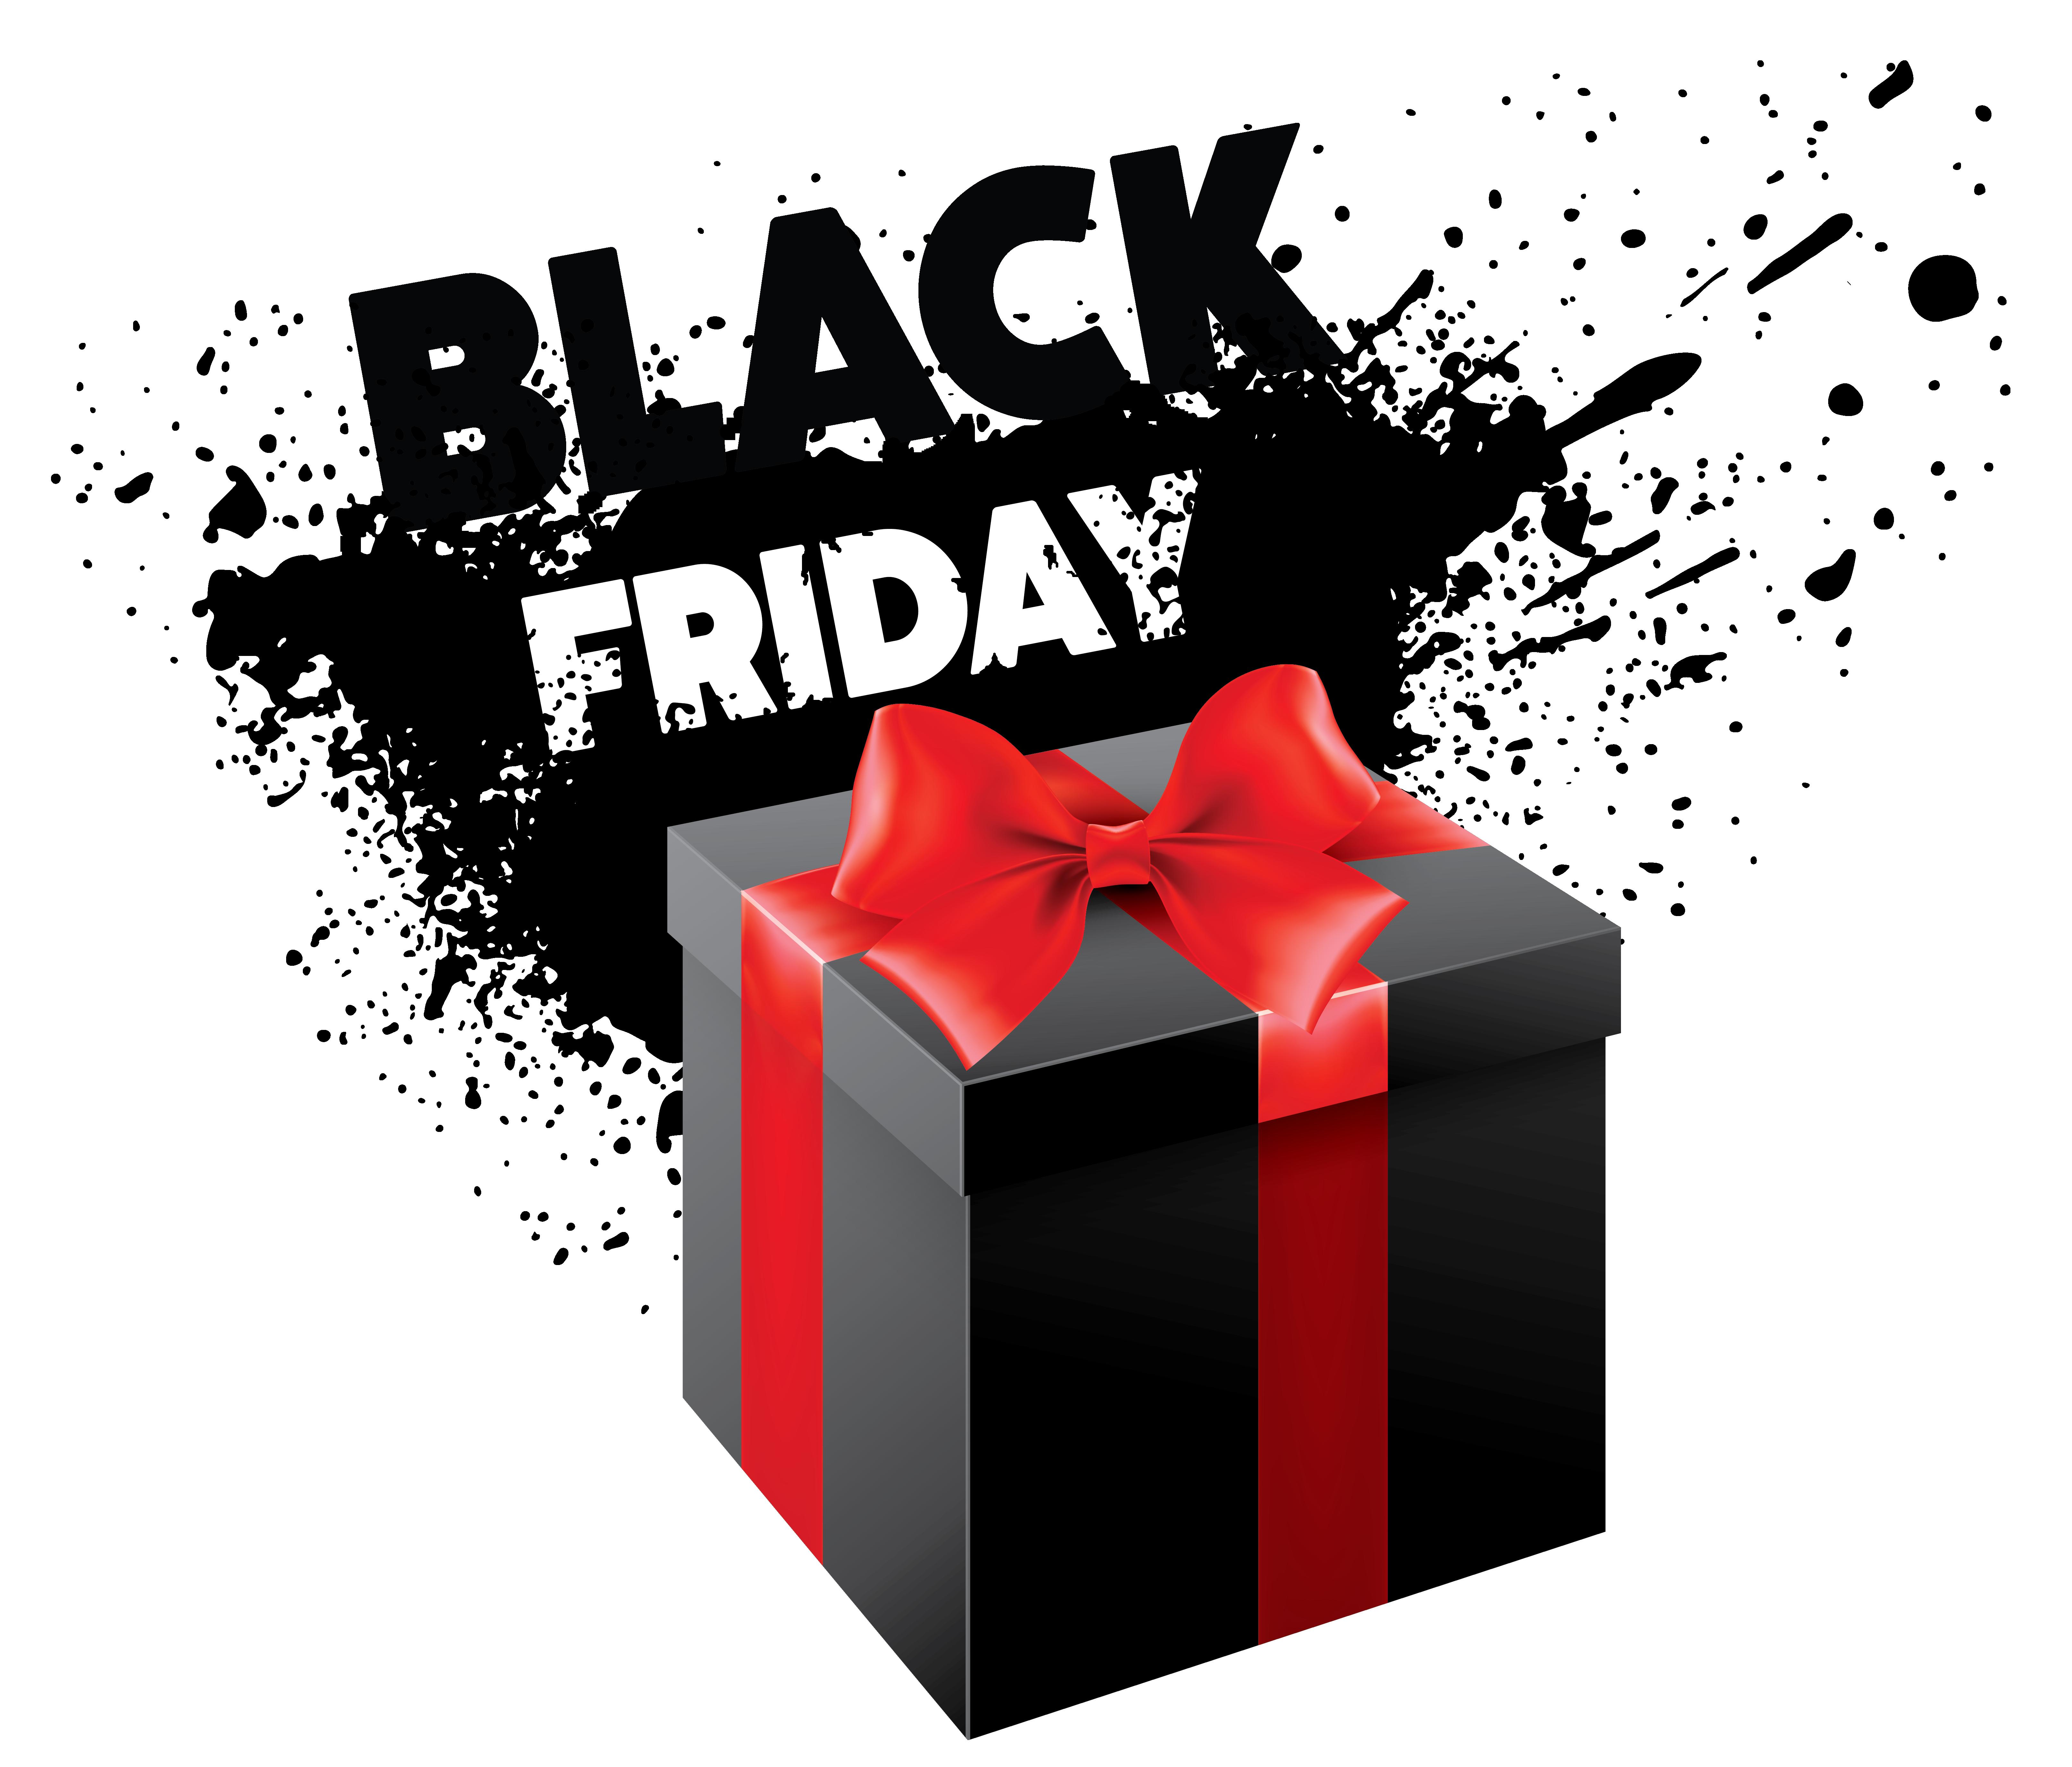 Black friday 2016 clipart jpg stock Black Friday 2016 Clipart jpg stock